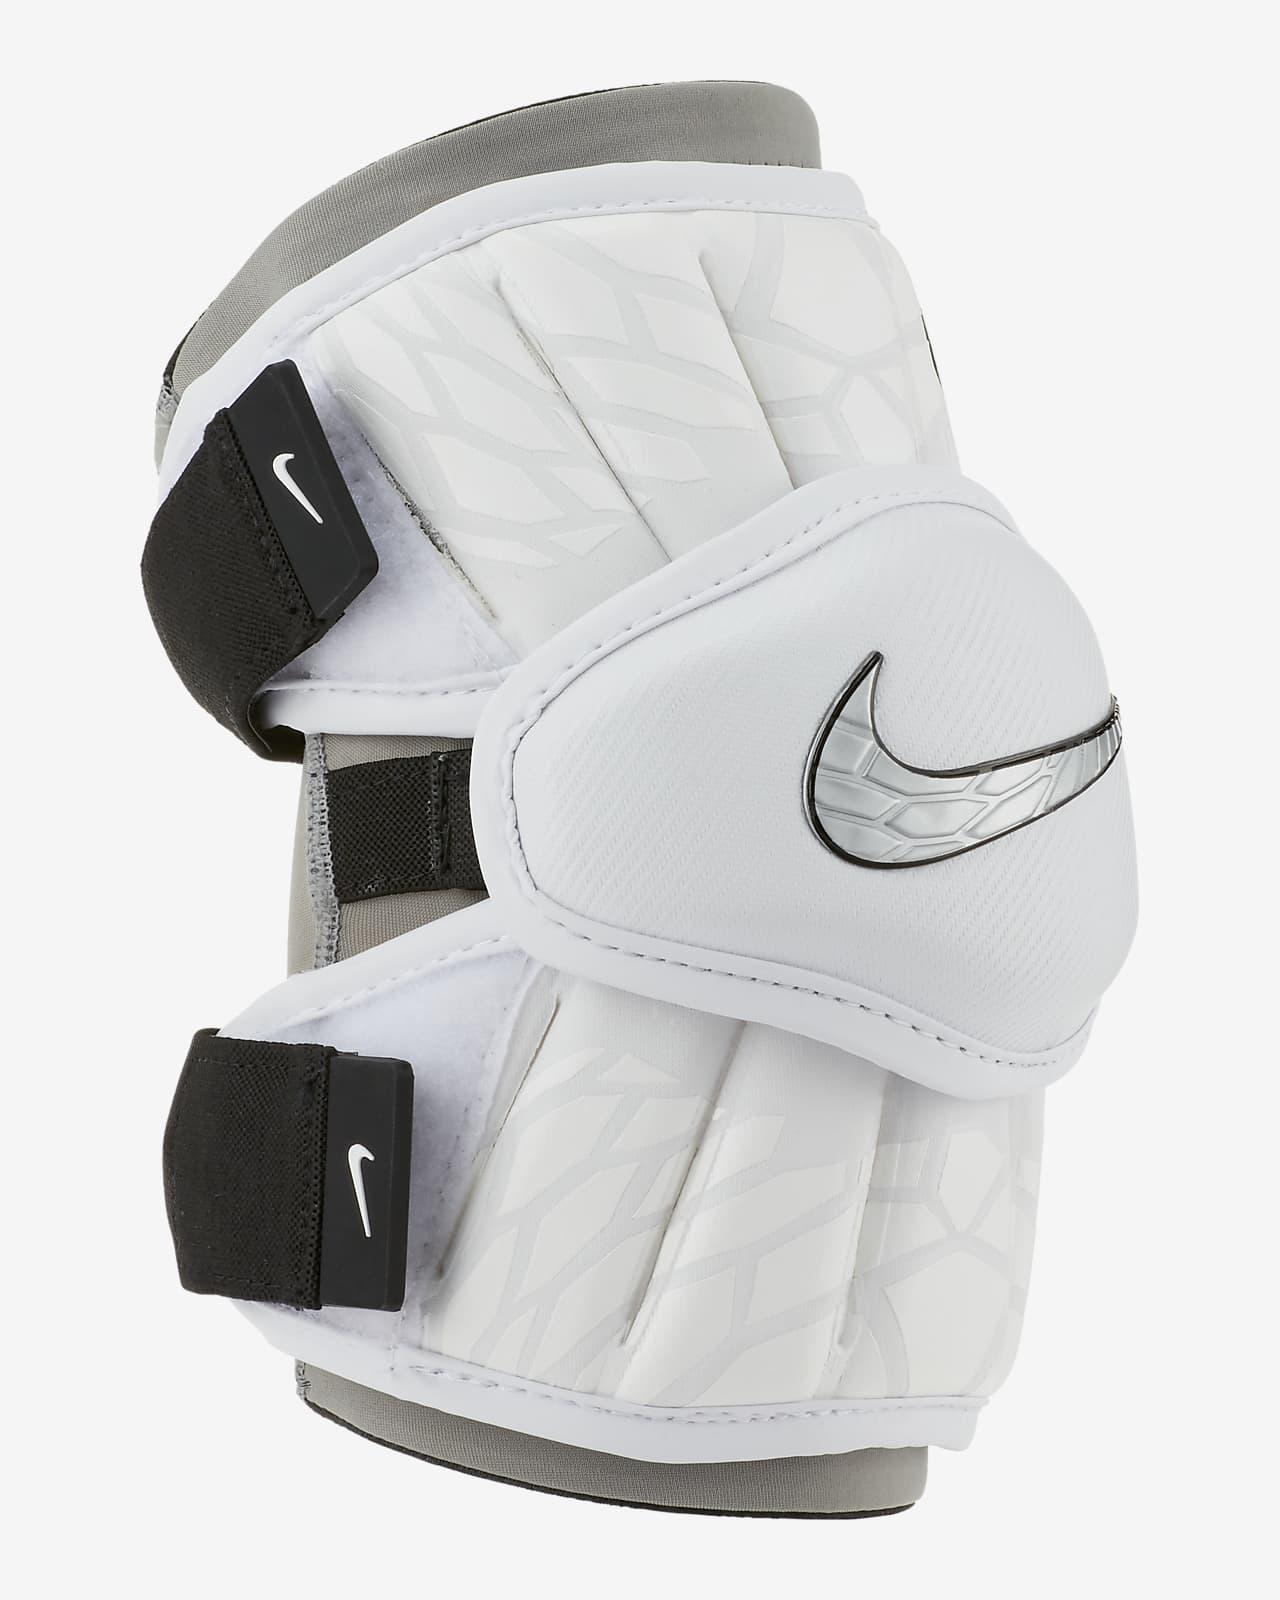 Nike Vapor Lacrosse Arm Pad